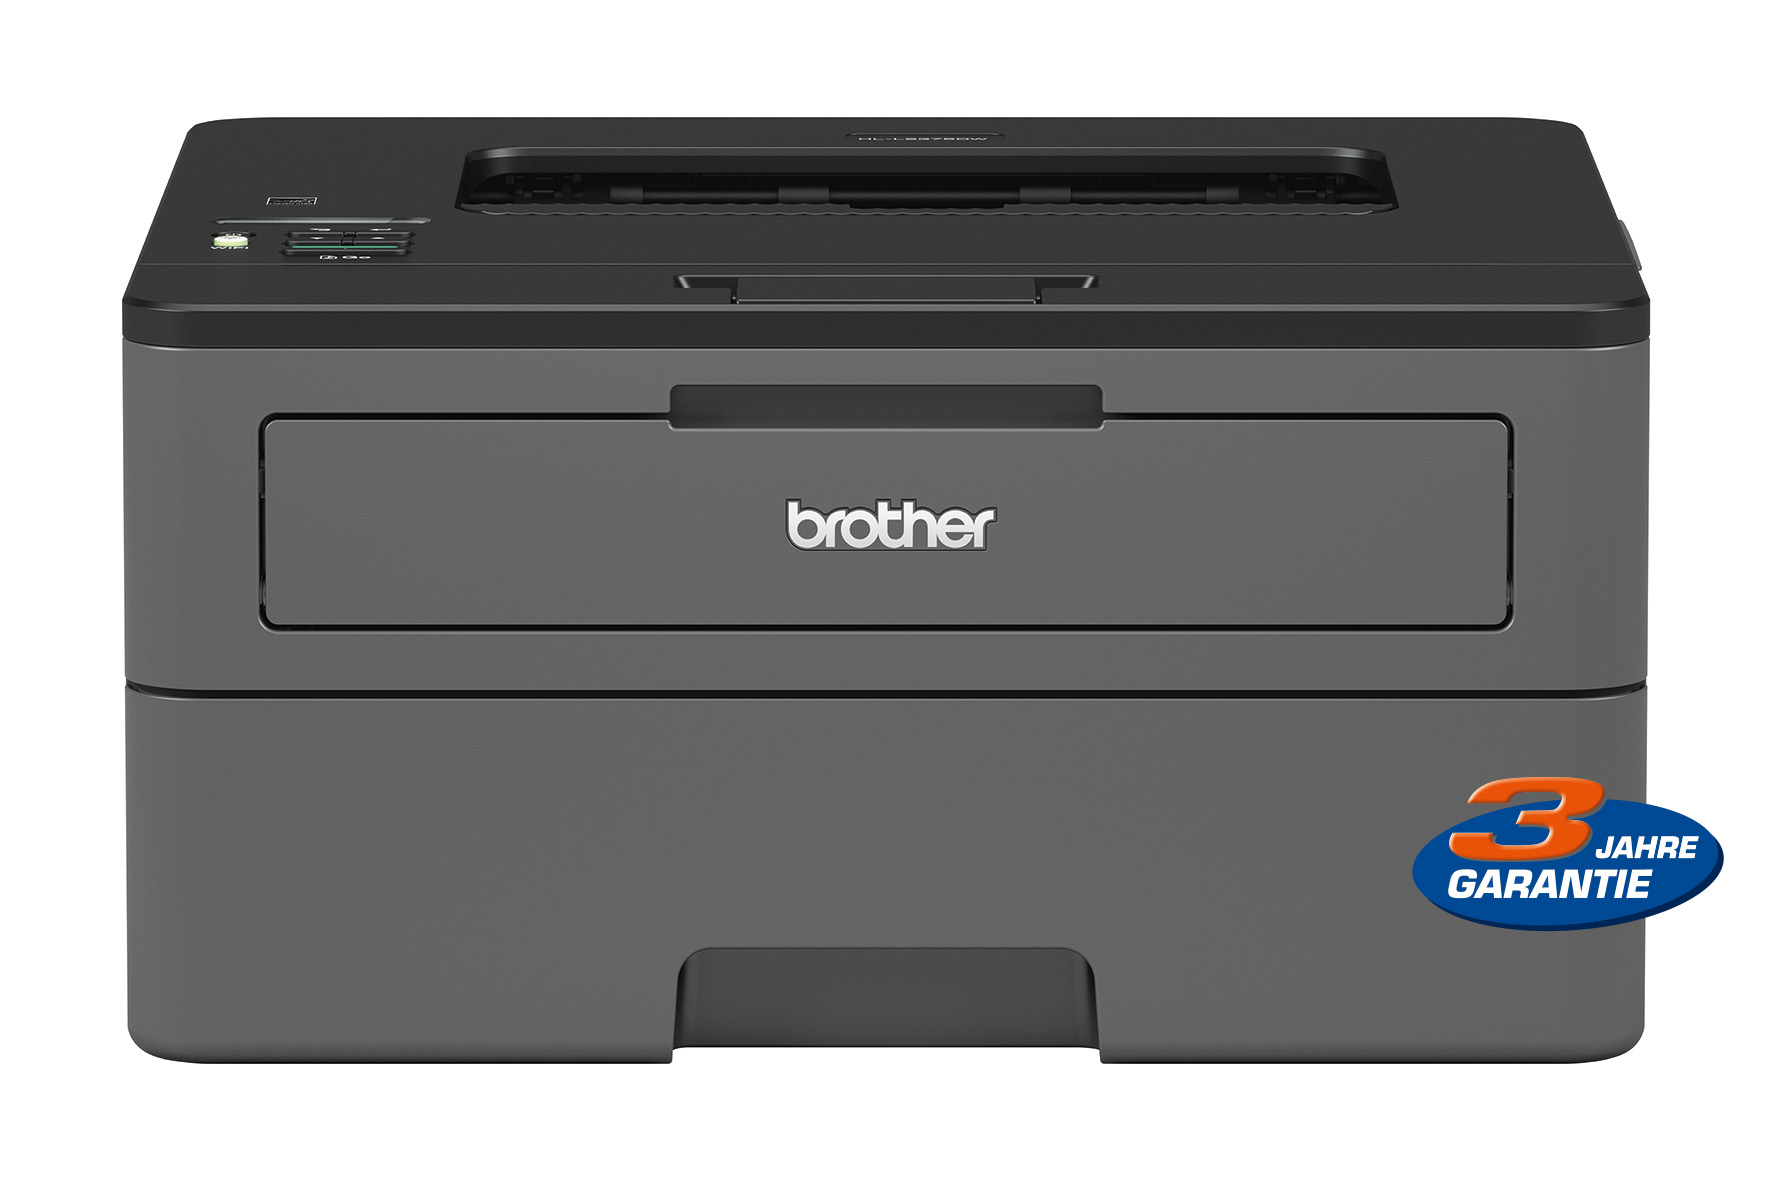 ORIGINAL Brother Drucker  HL-L2375DW HLL2375DWG1 Brother HL-L2375DW S/W Laserdrucker